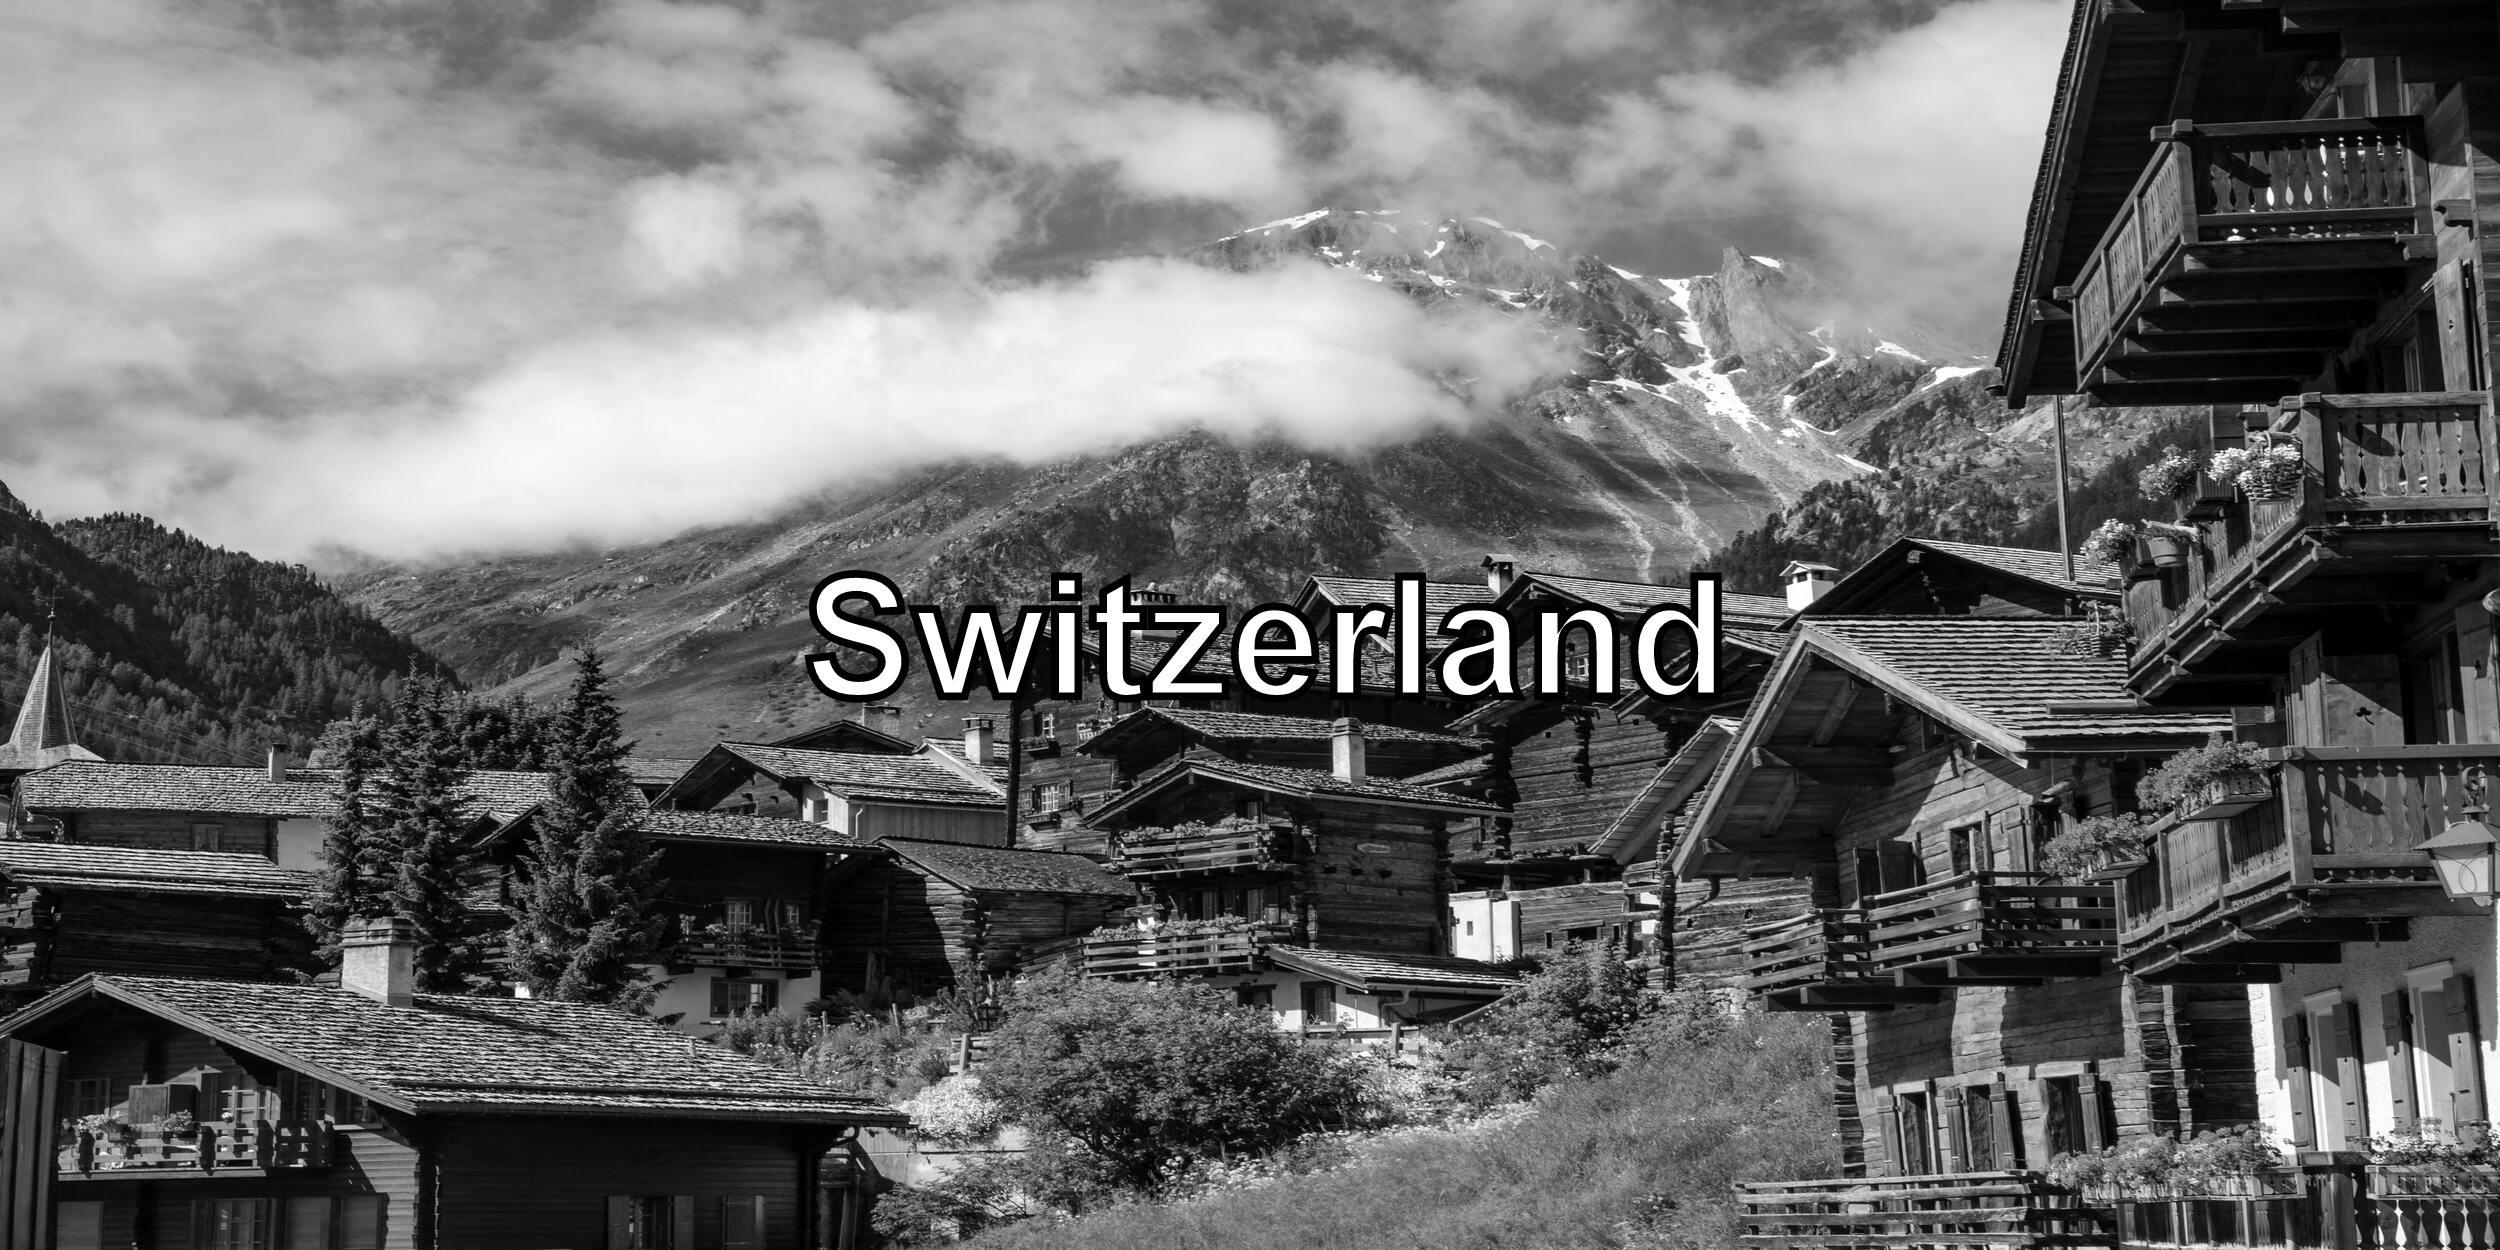 Sending WEC Switzerland